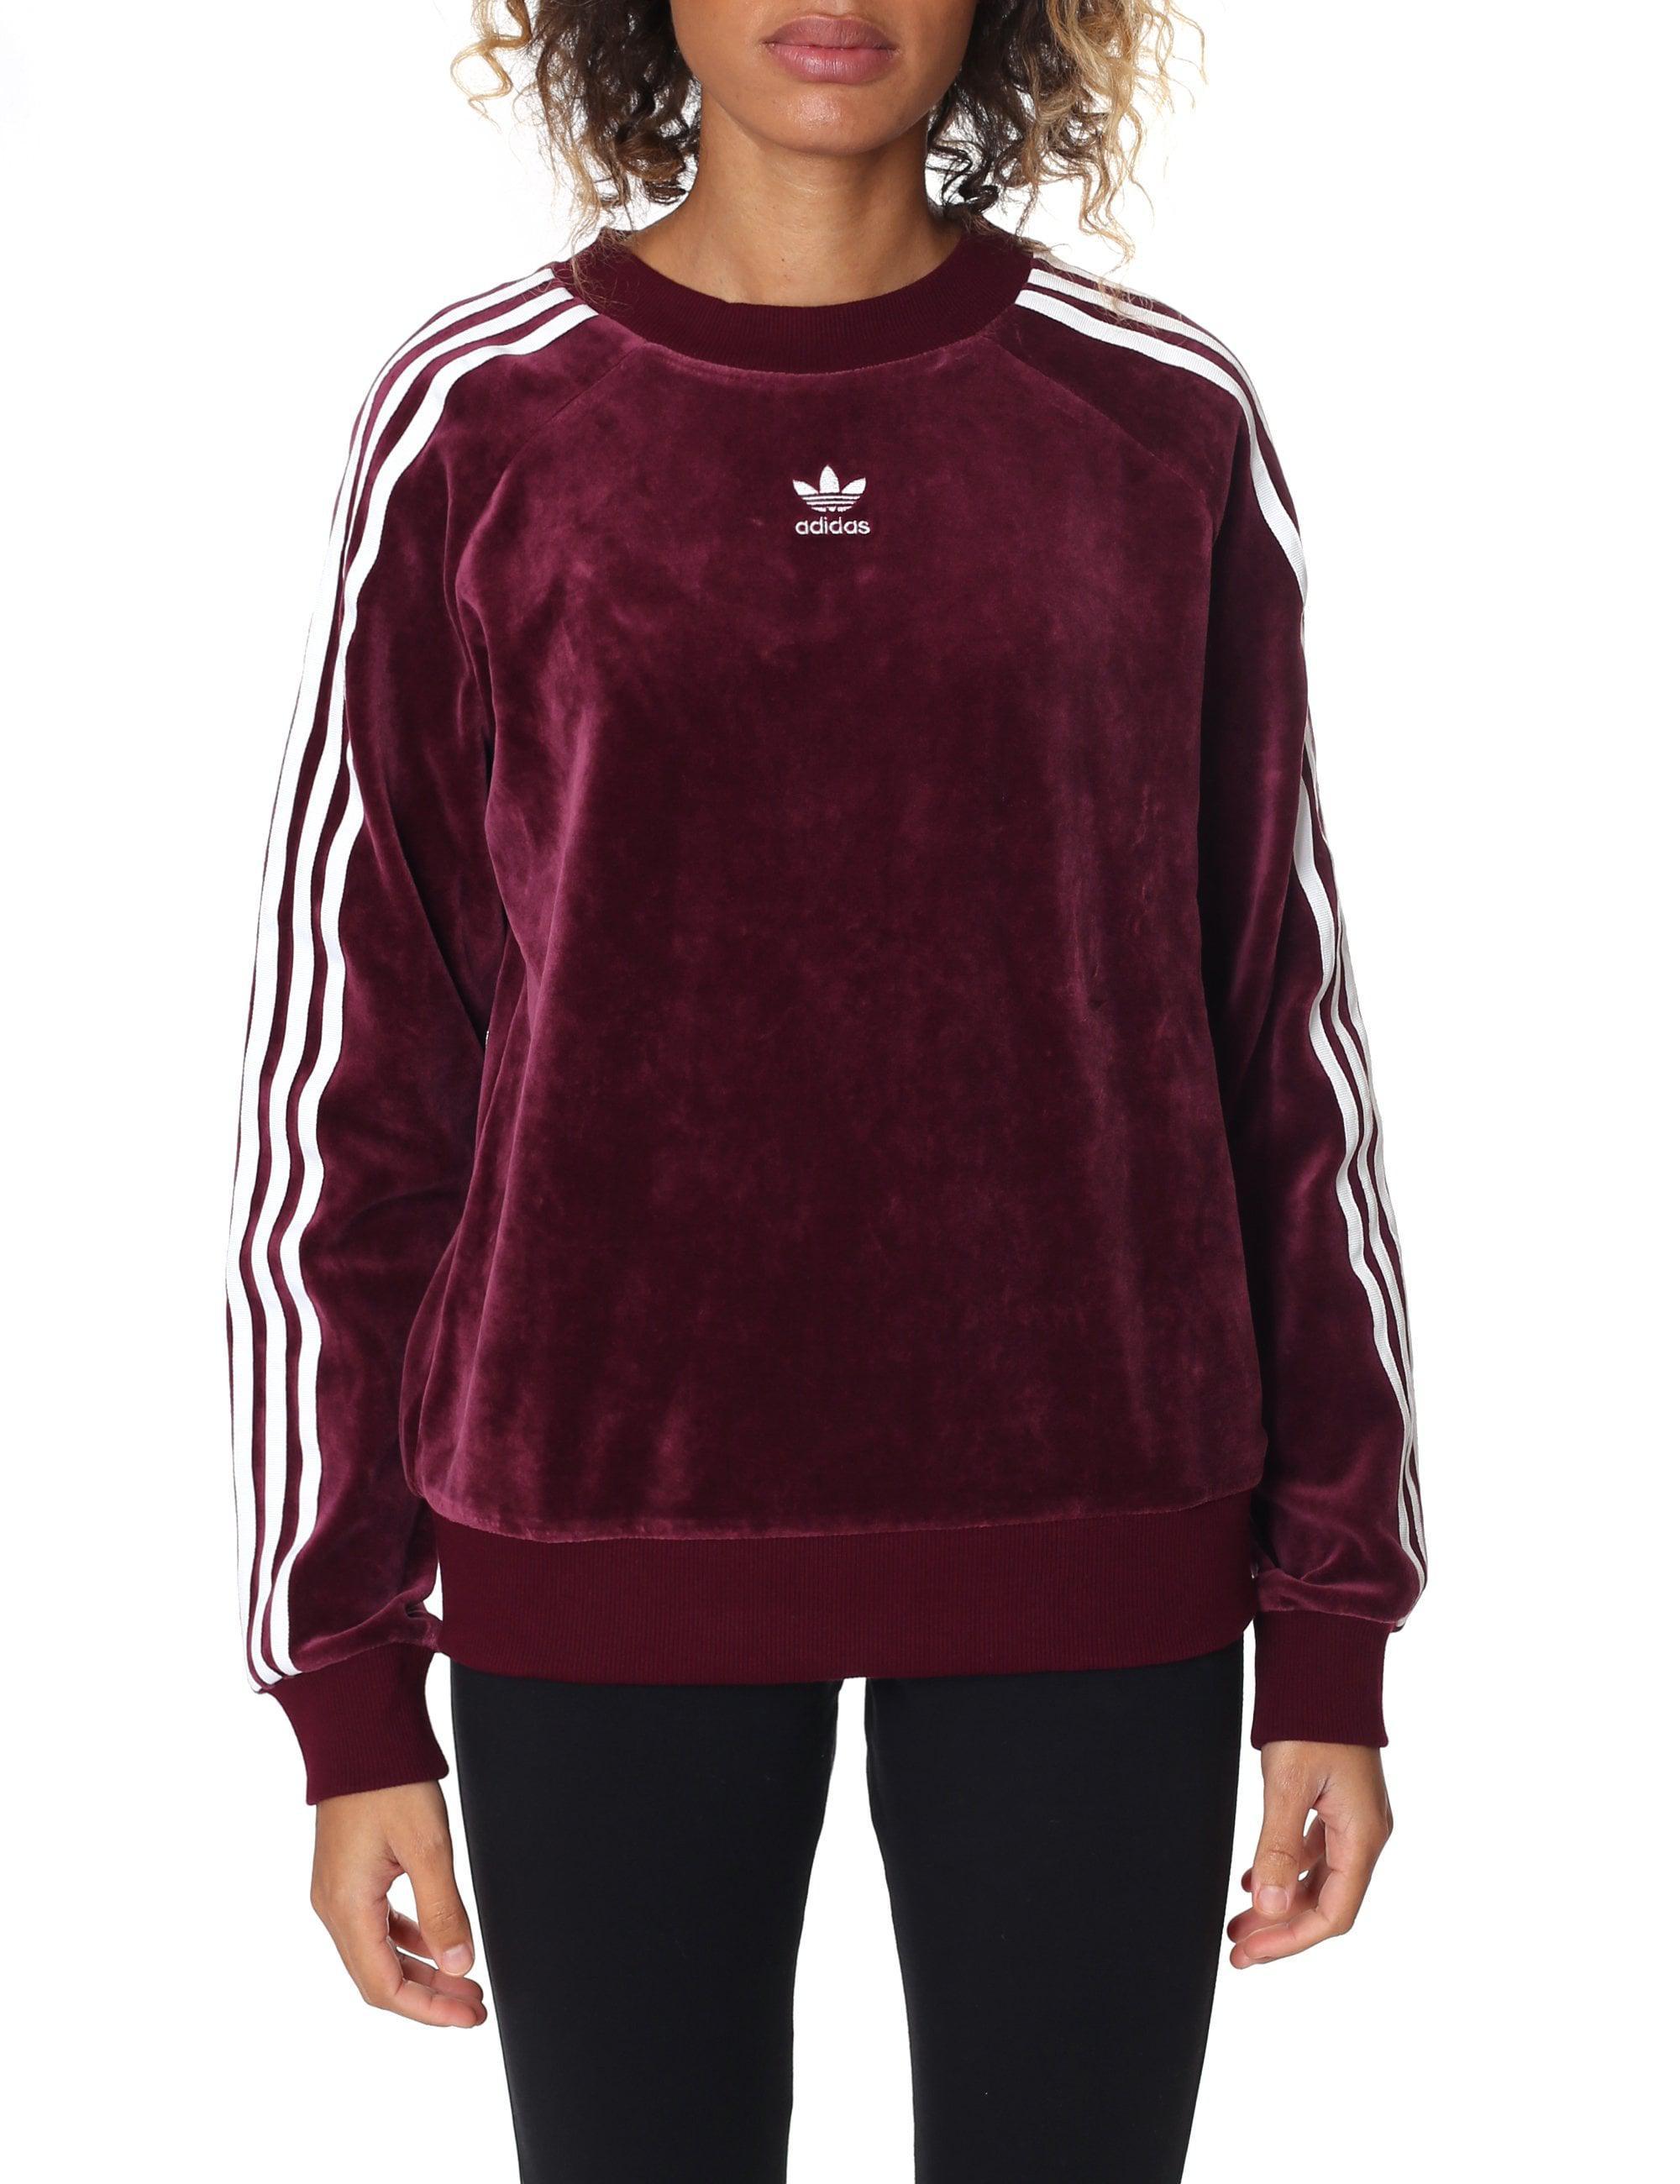 f597528df9de Gallery. Previously sold at  Diffusion · Women s Logo Sweatshirts ...